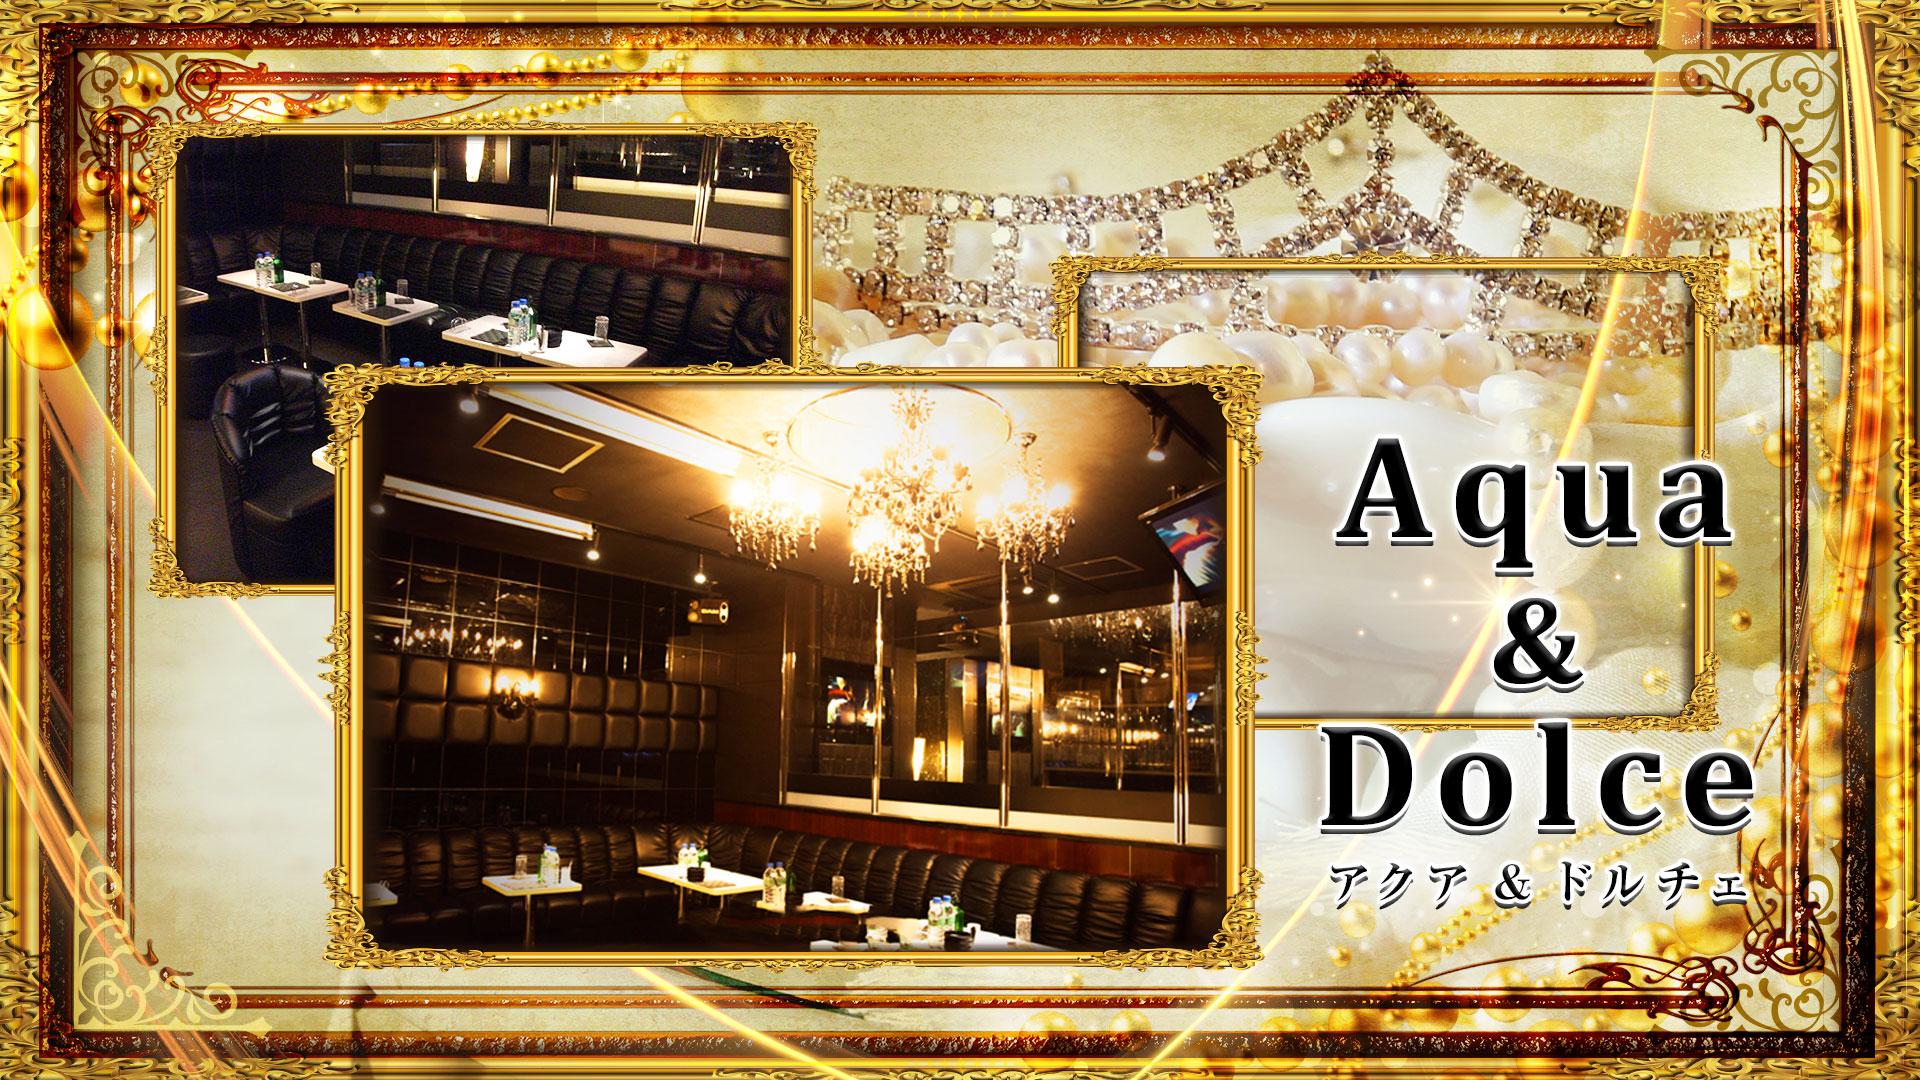 Aqua & Dolce[アクアアンドドルチェ] 八王子 キャバクラ TOP画像